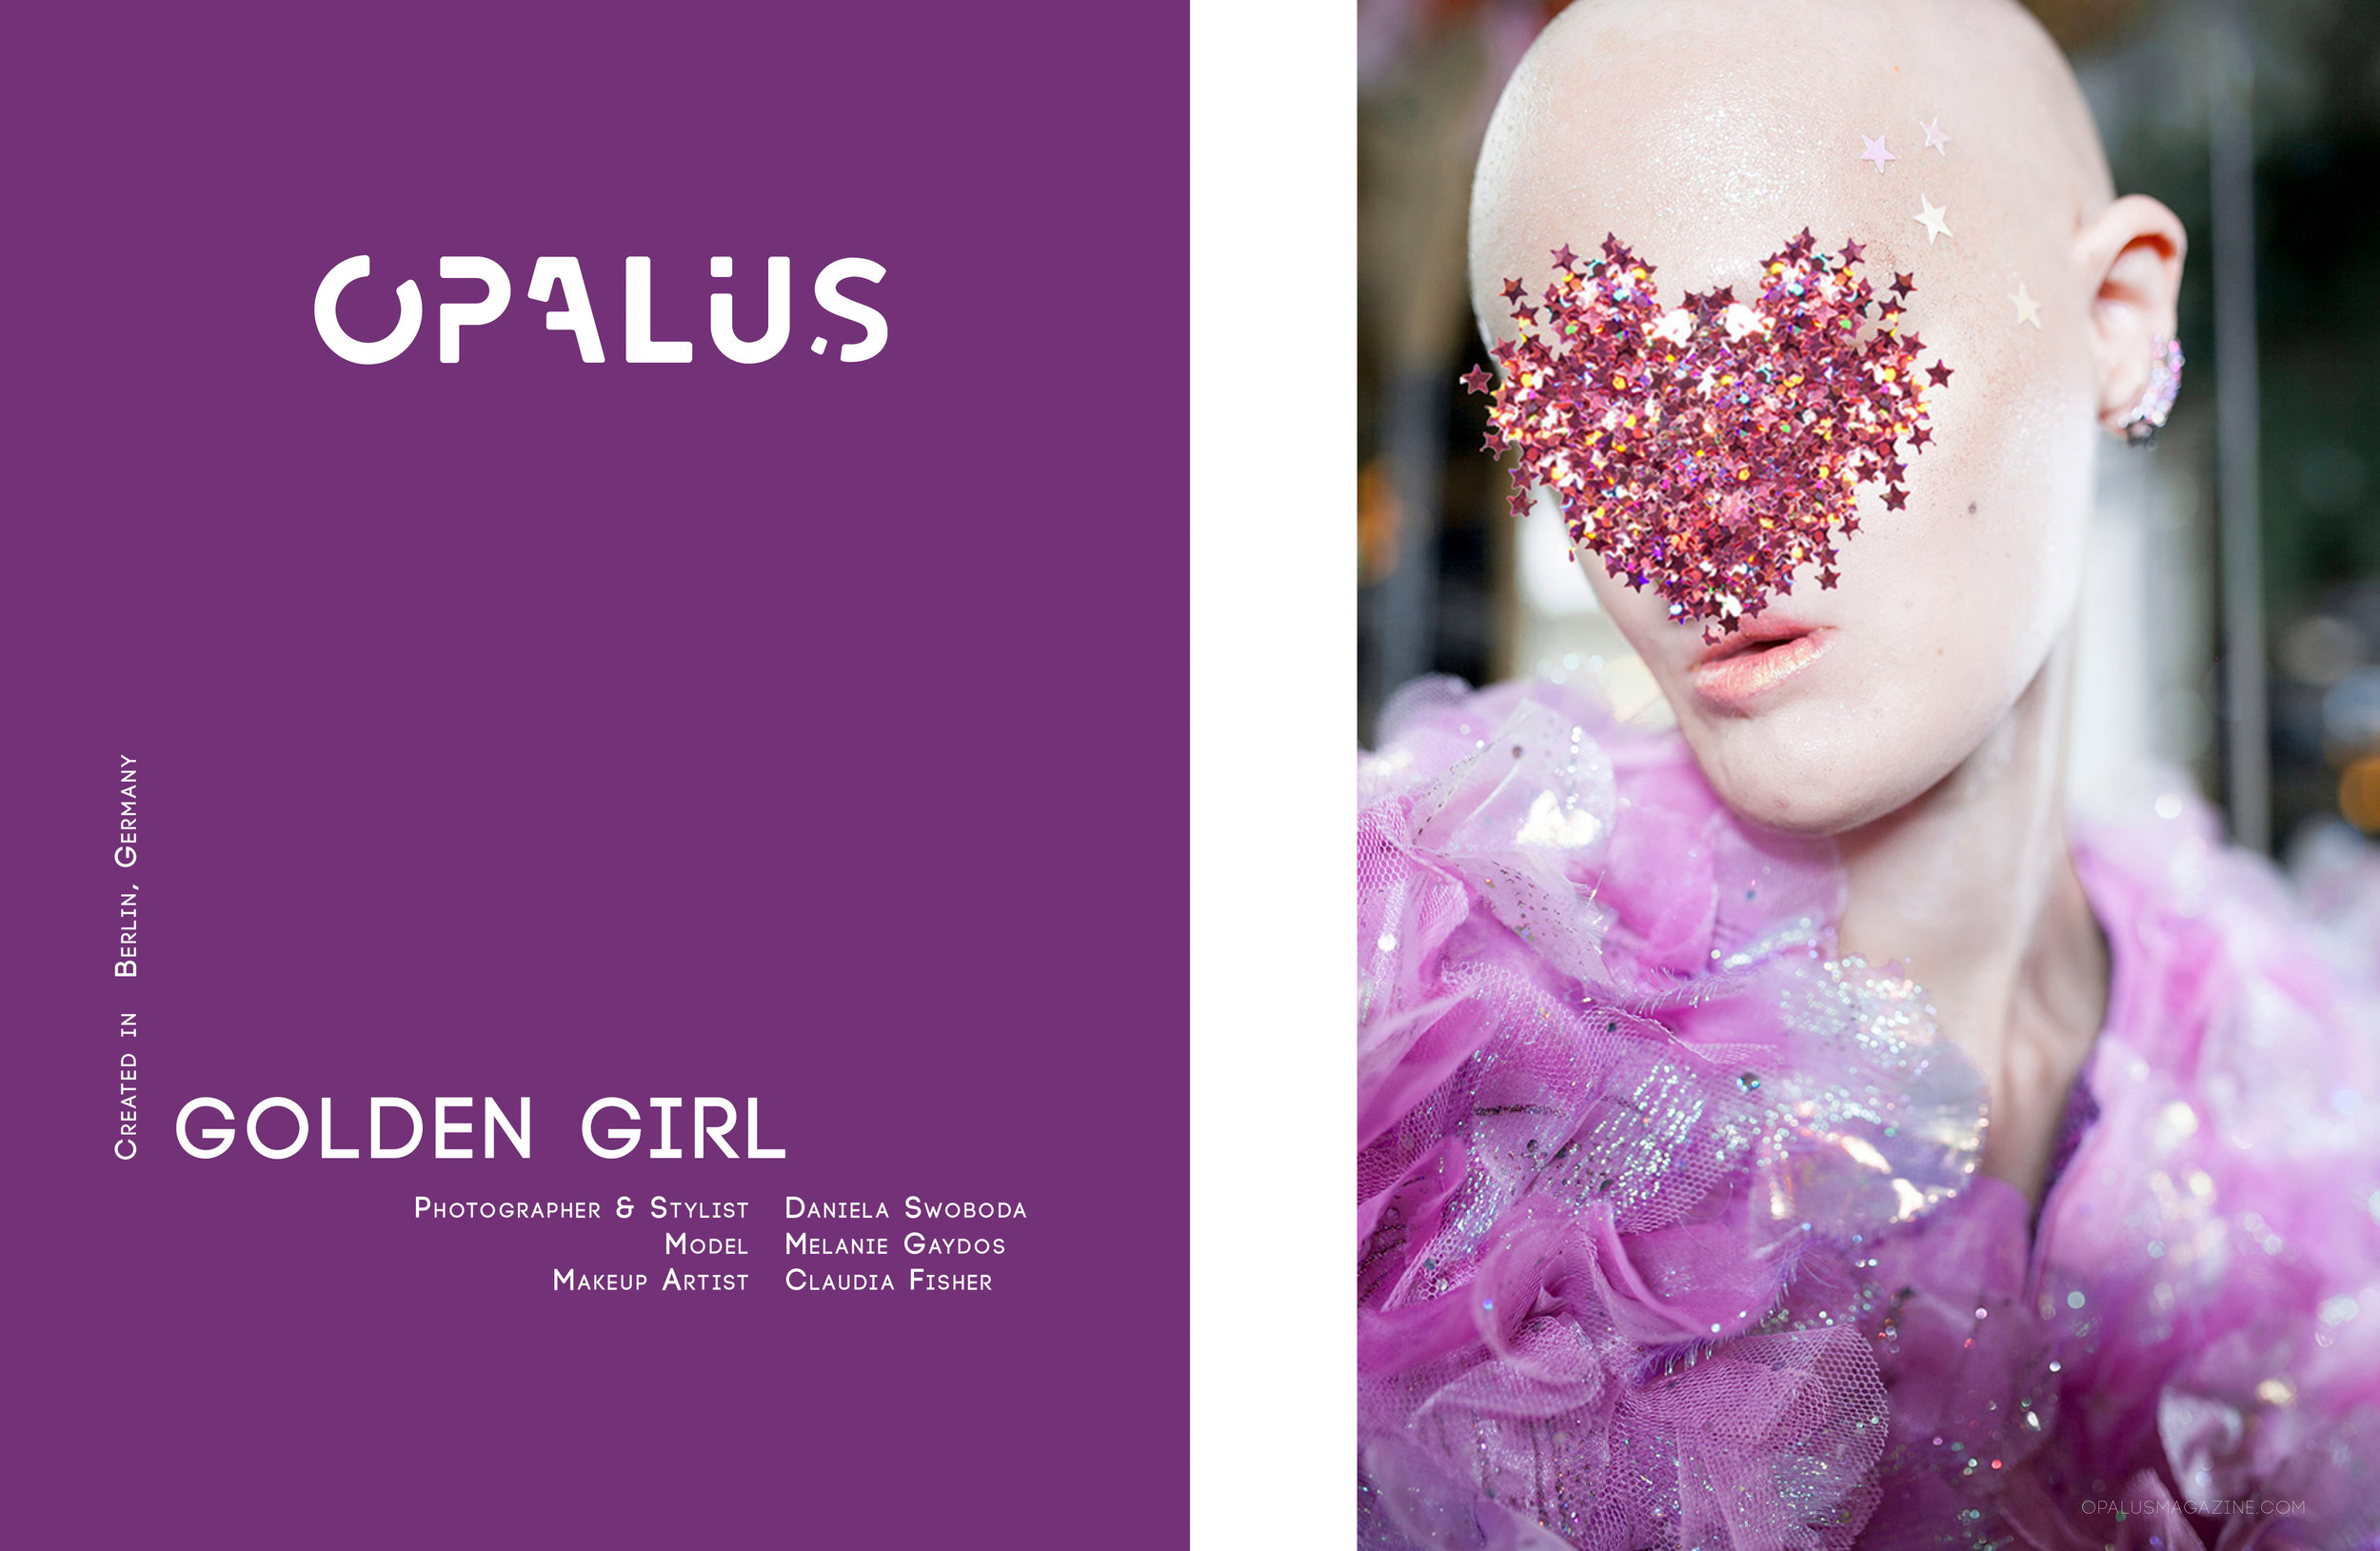 GoldenGirl_opalusmagazine_web-1-2.jpg